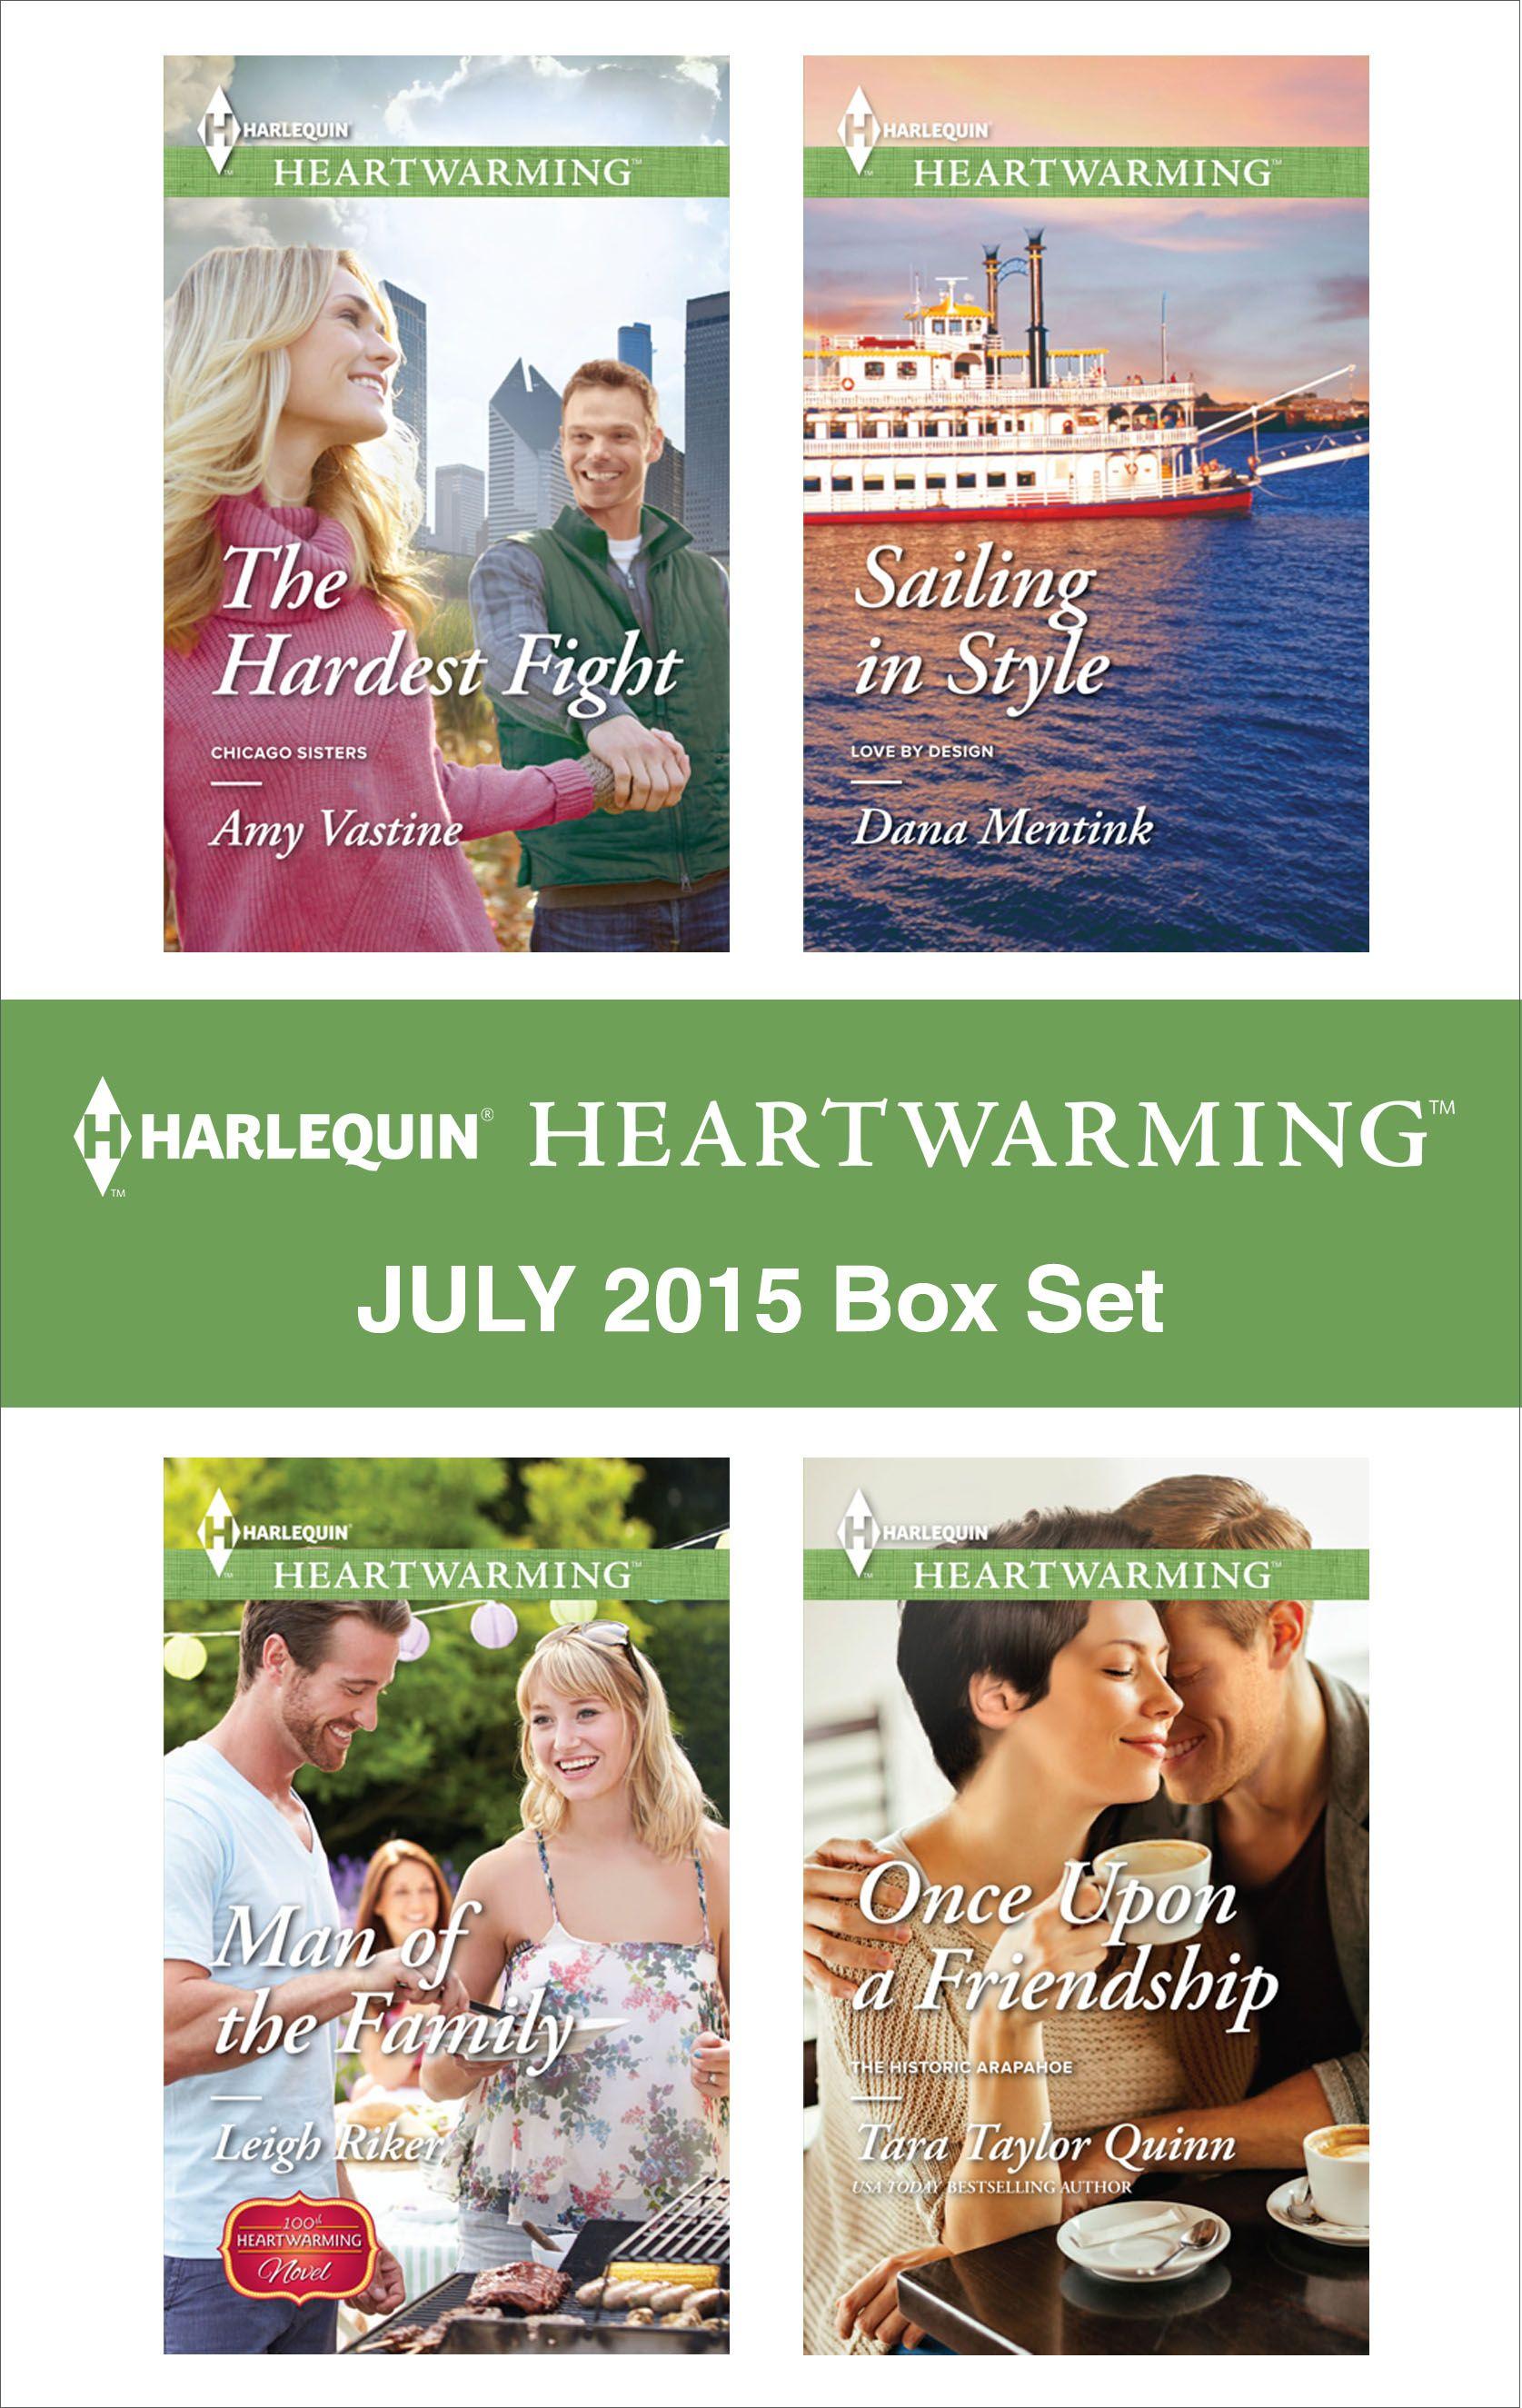 Harlequin Boxset, Harlequin, Heartwarming